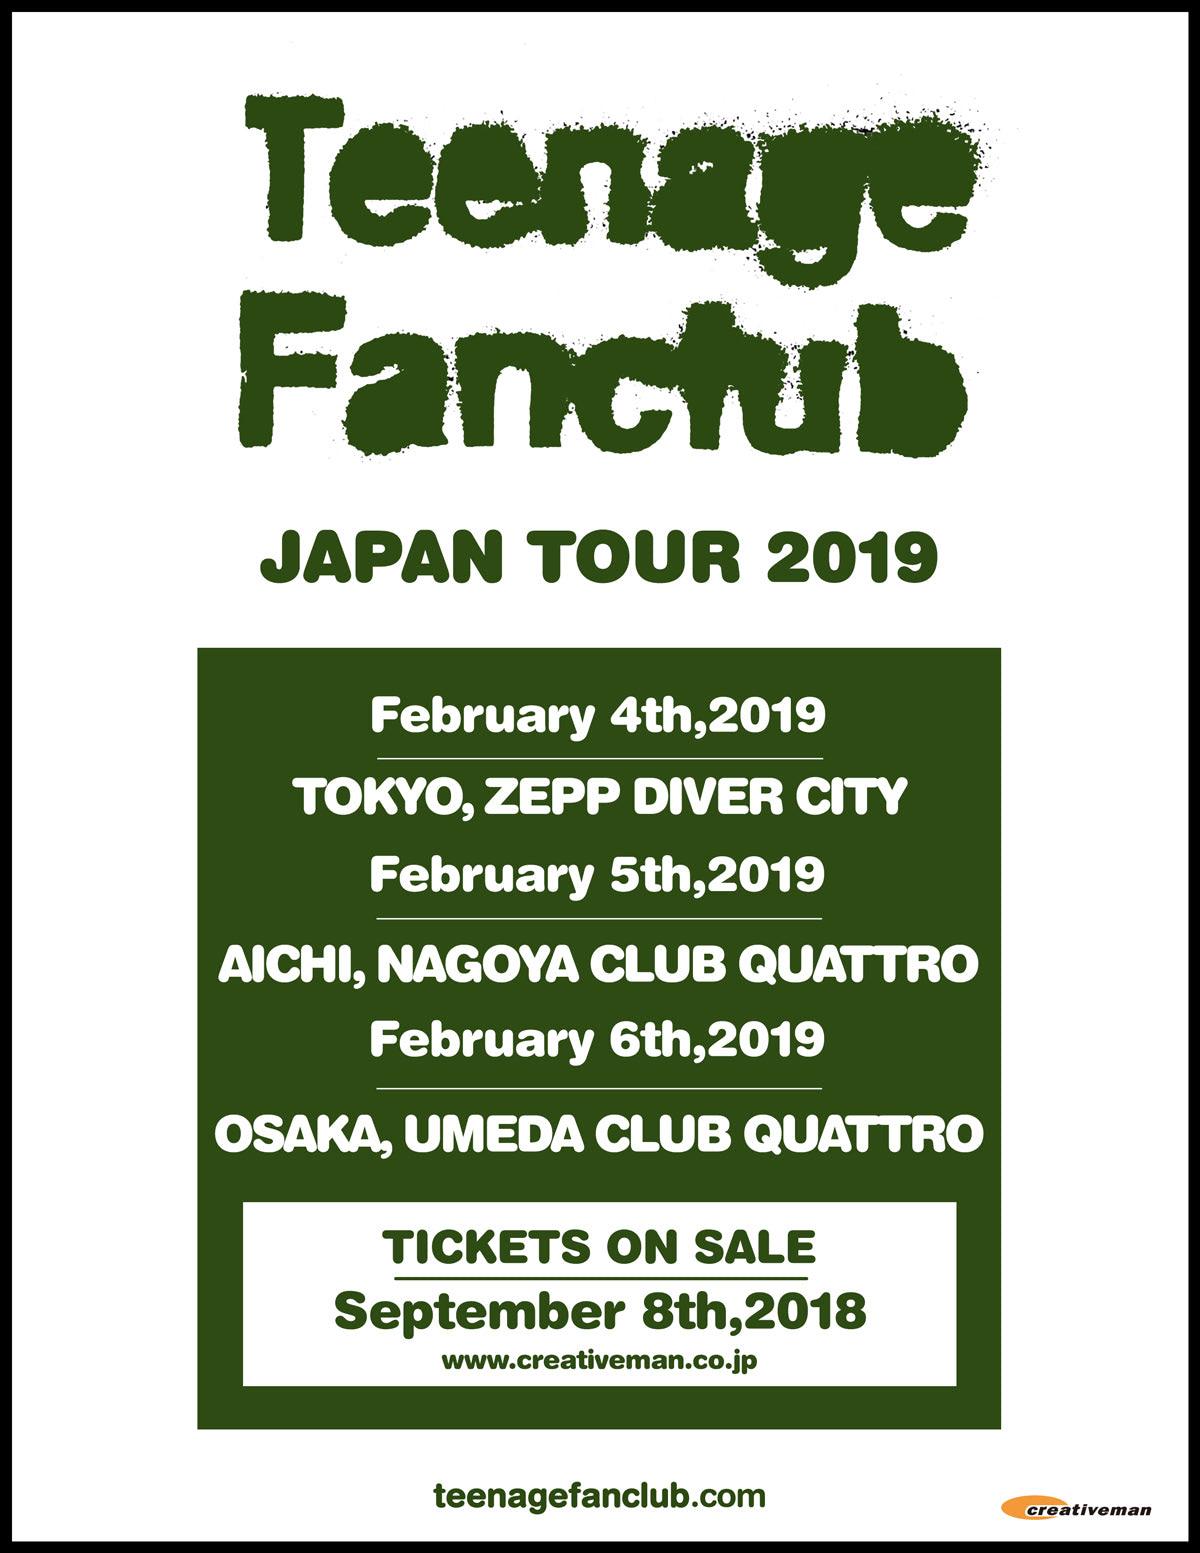 TEENAGE FANCLUB JAPAN TOUR 2019